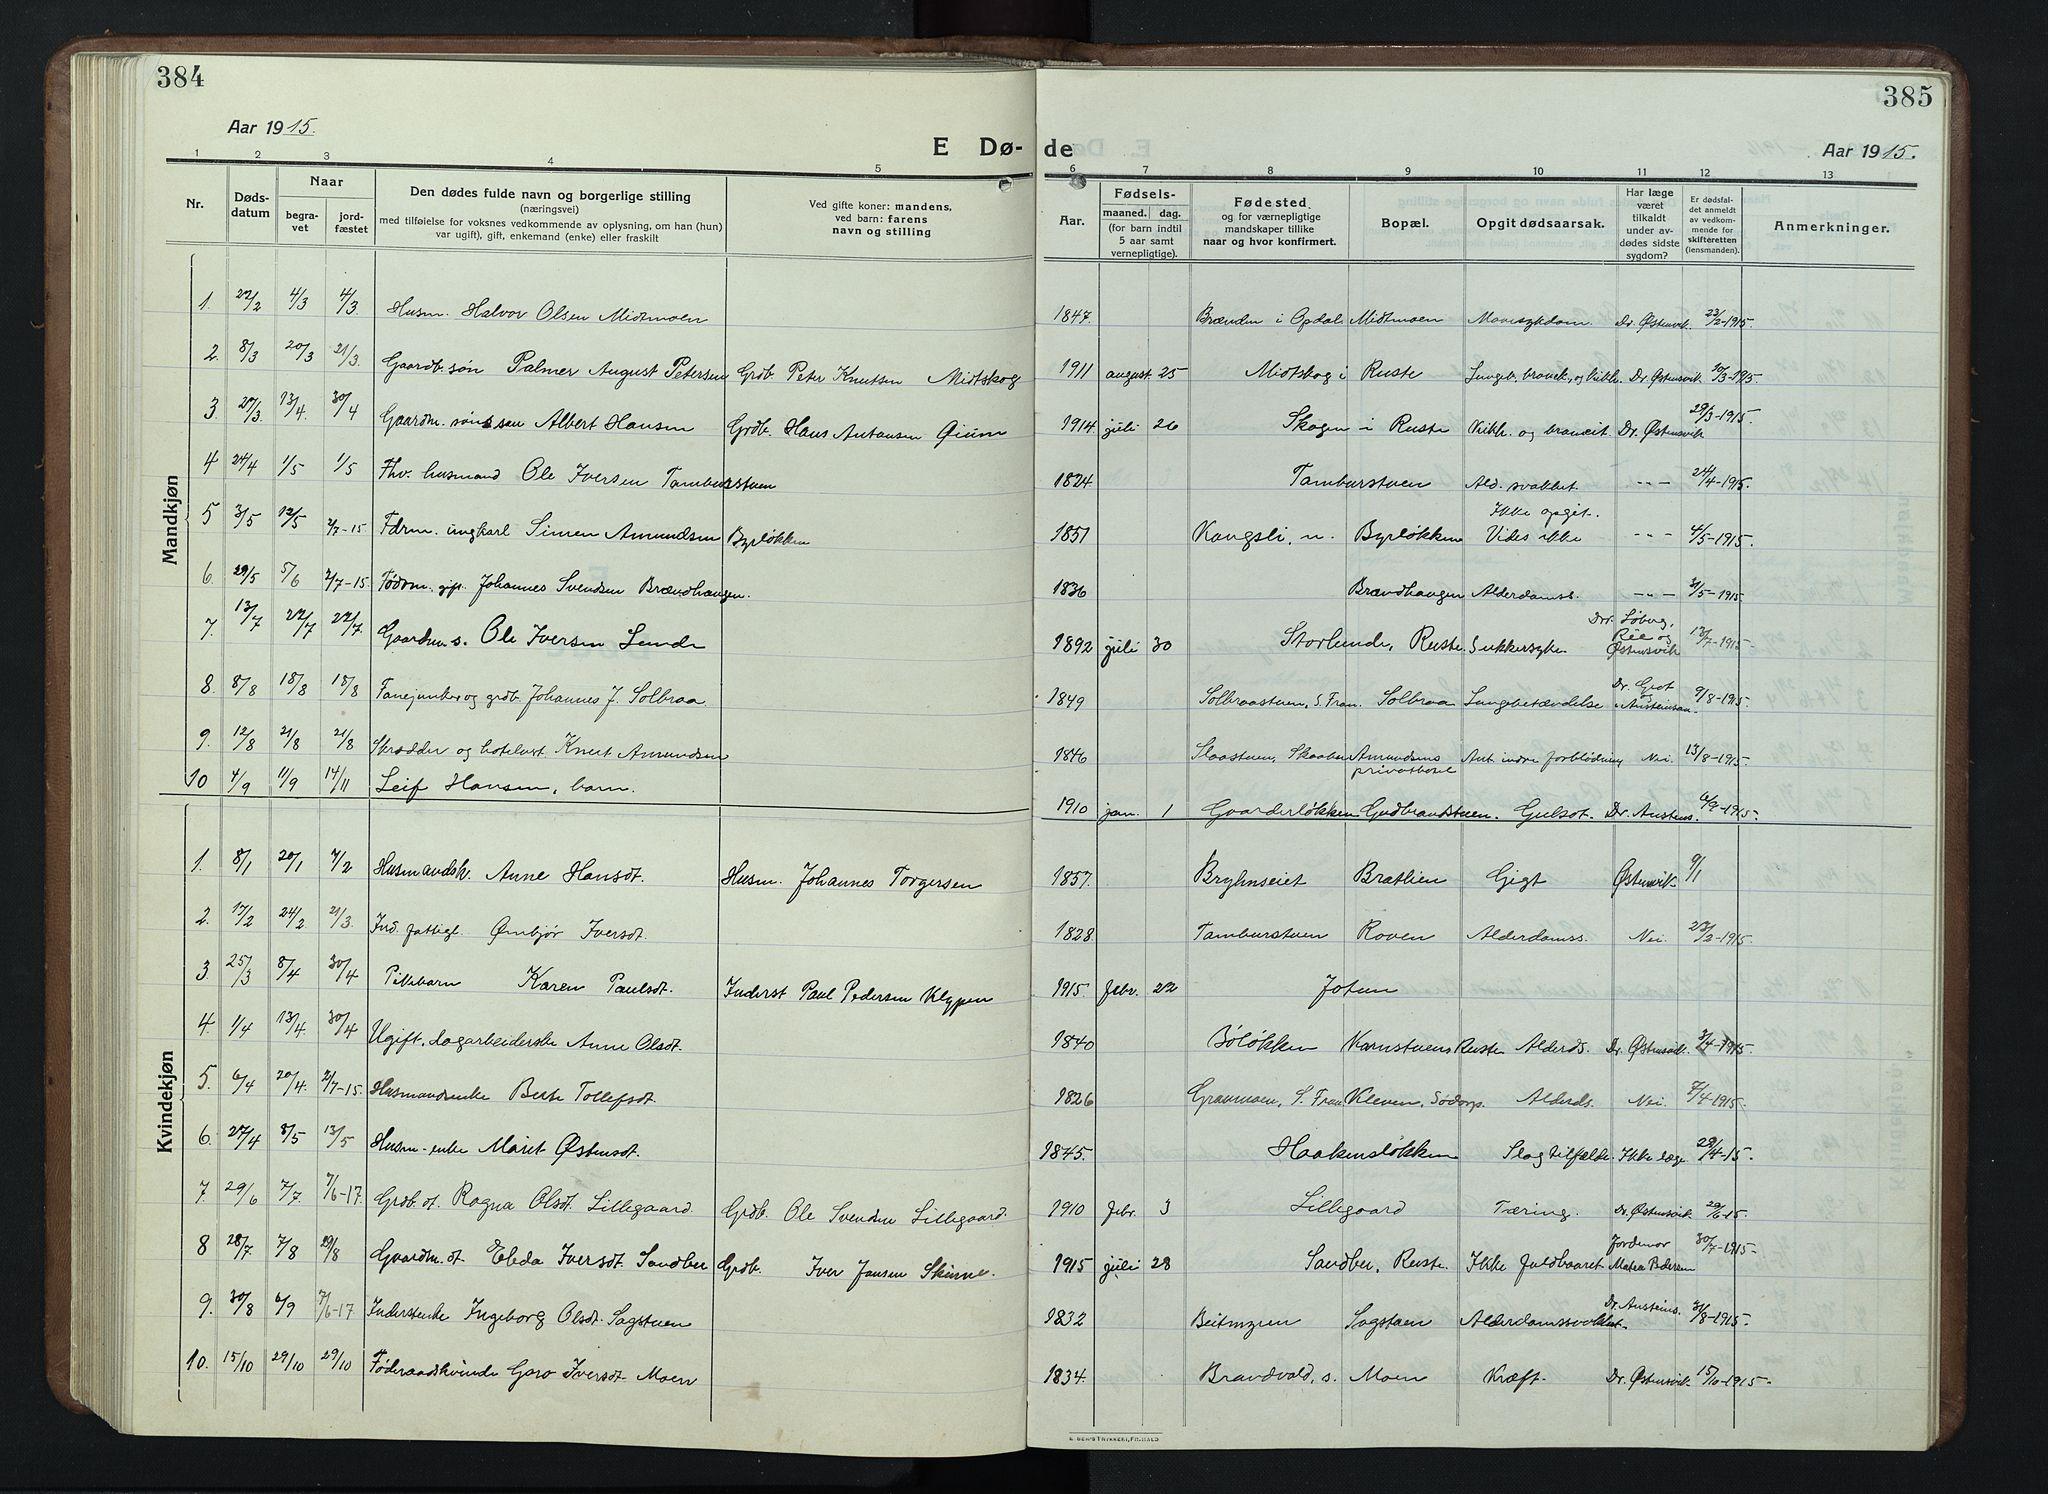 SAH, Nord-Fron prestekontor, Klokkerbok nr. 7, 1915-1946, s. 384-385